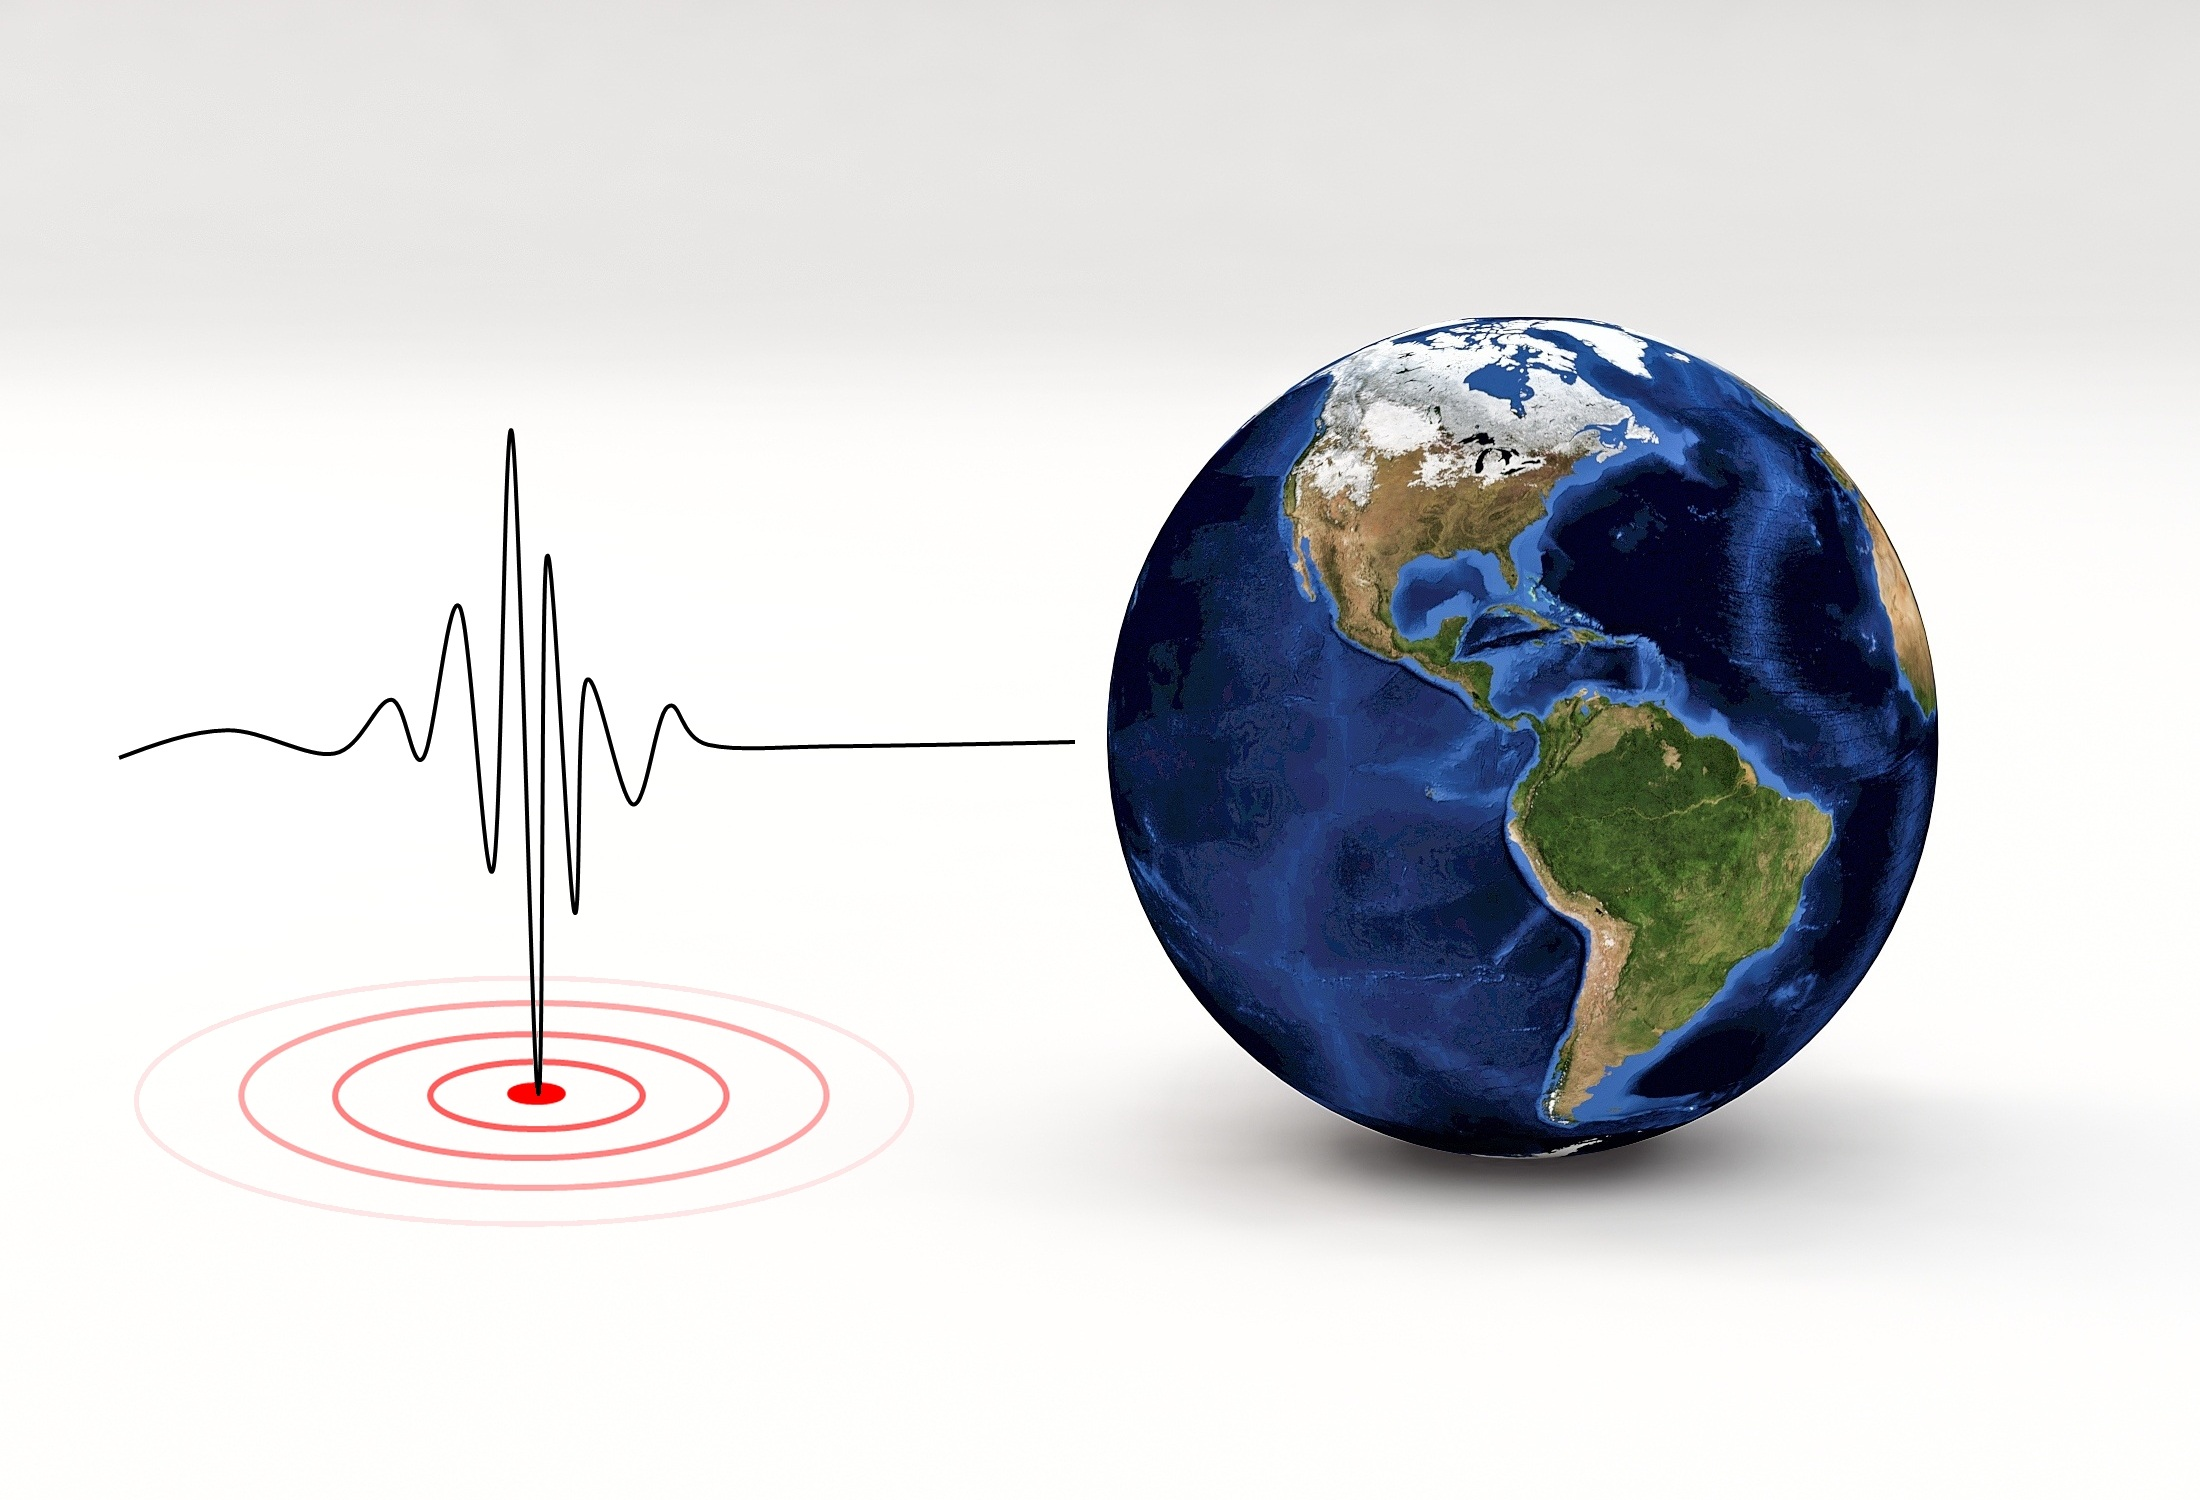 Jordskælv